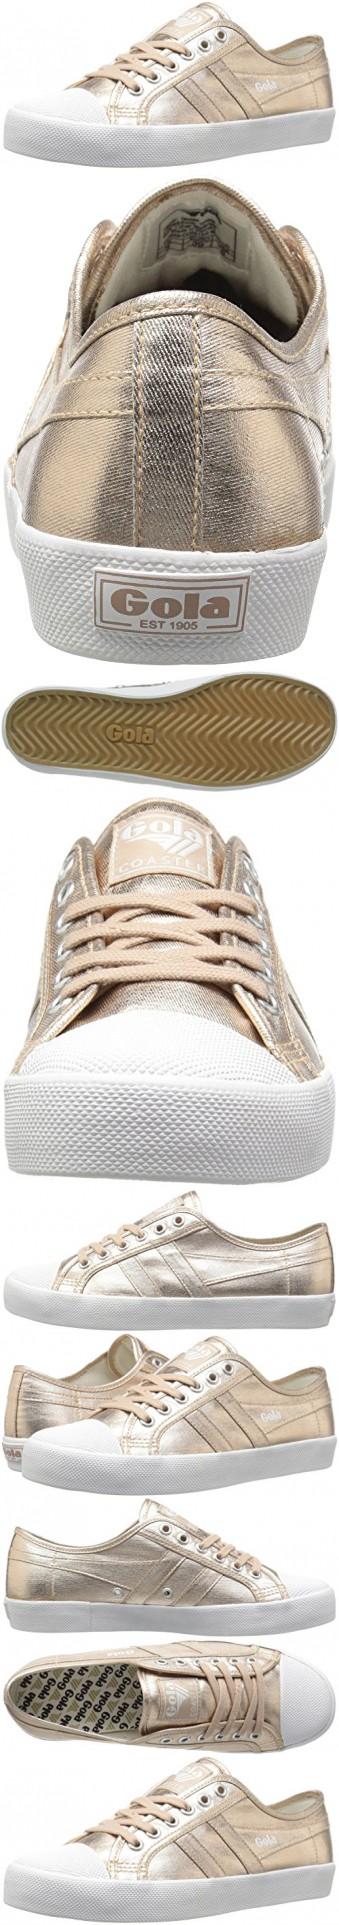 14916a43c0e7 Gola Women s Coaster Metallic Fashion Sneaker